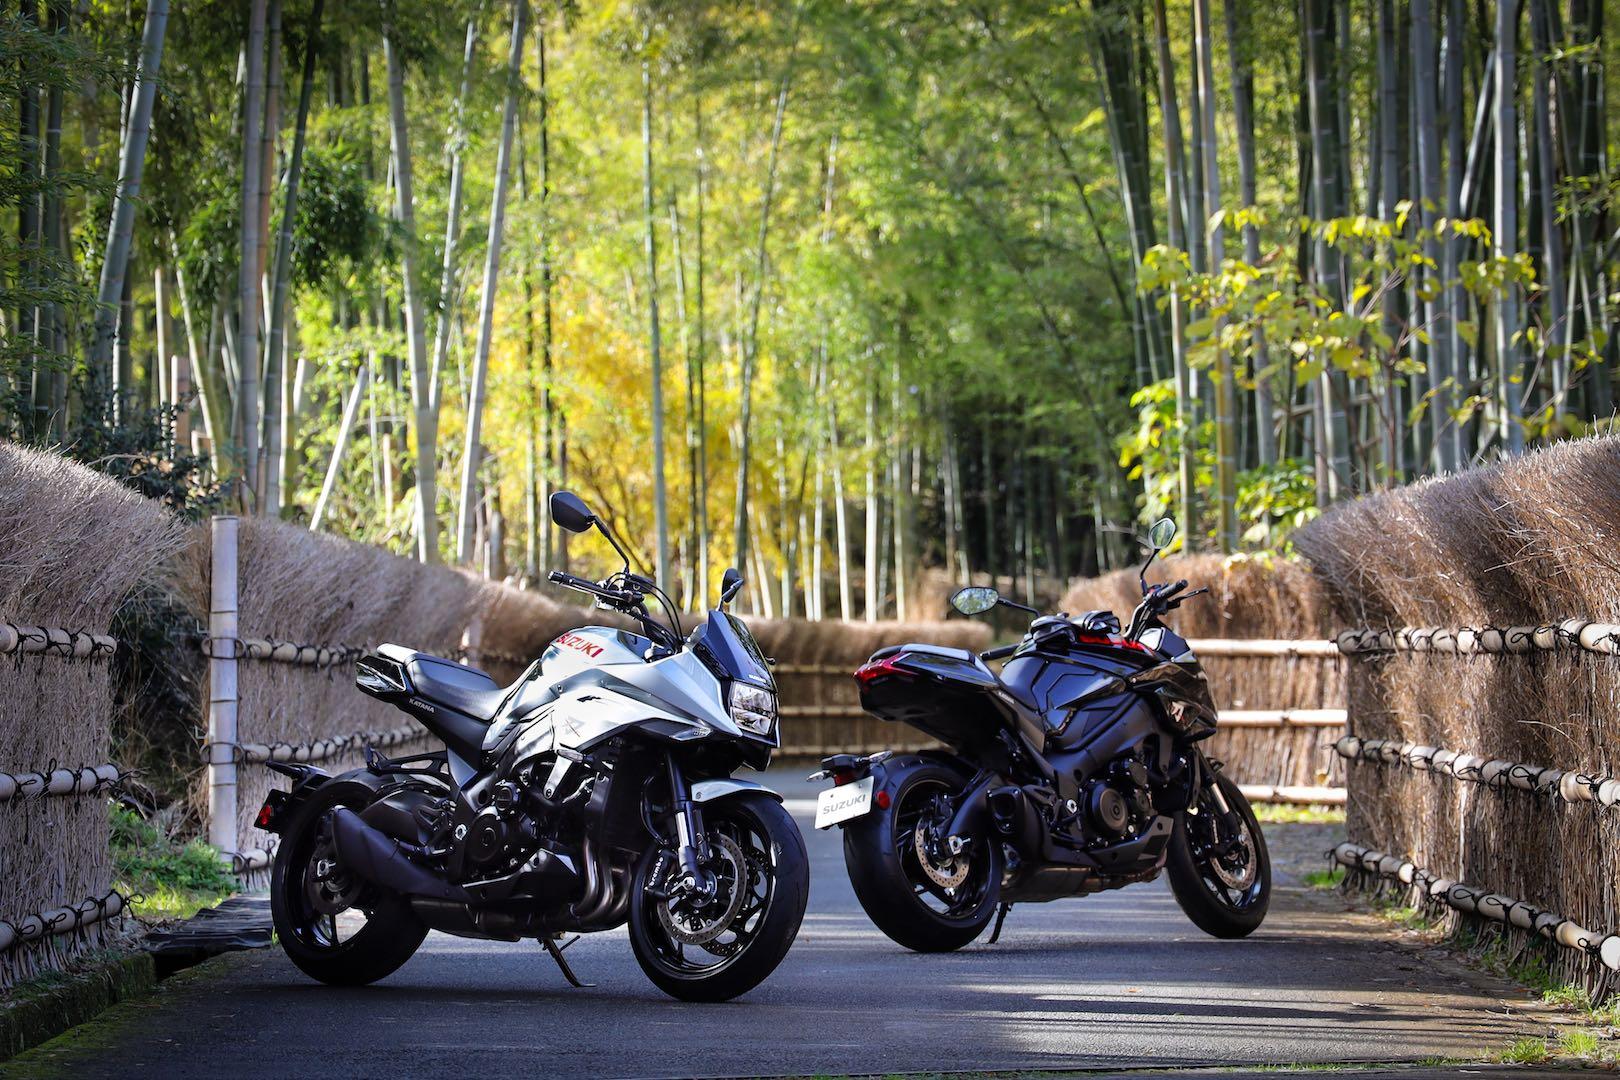 2020 Suzuki Katana in homeland